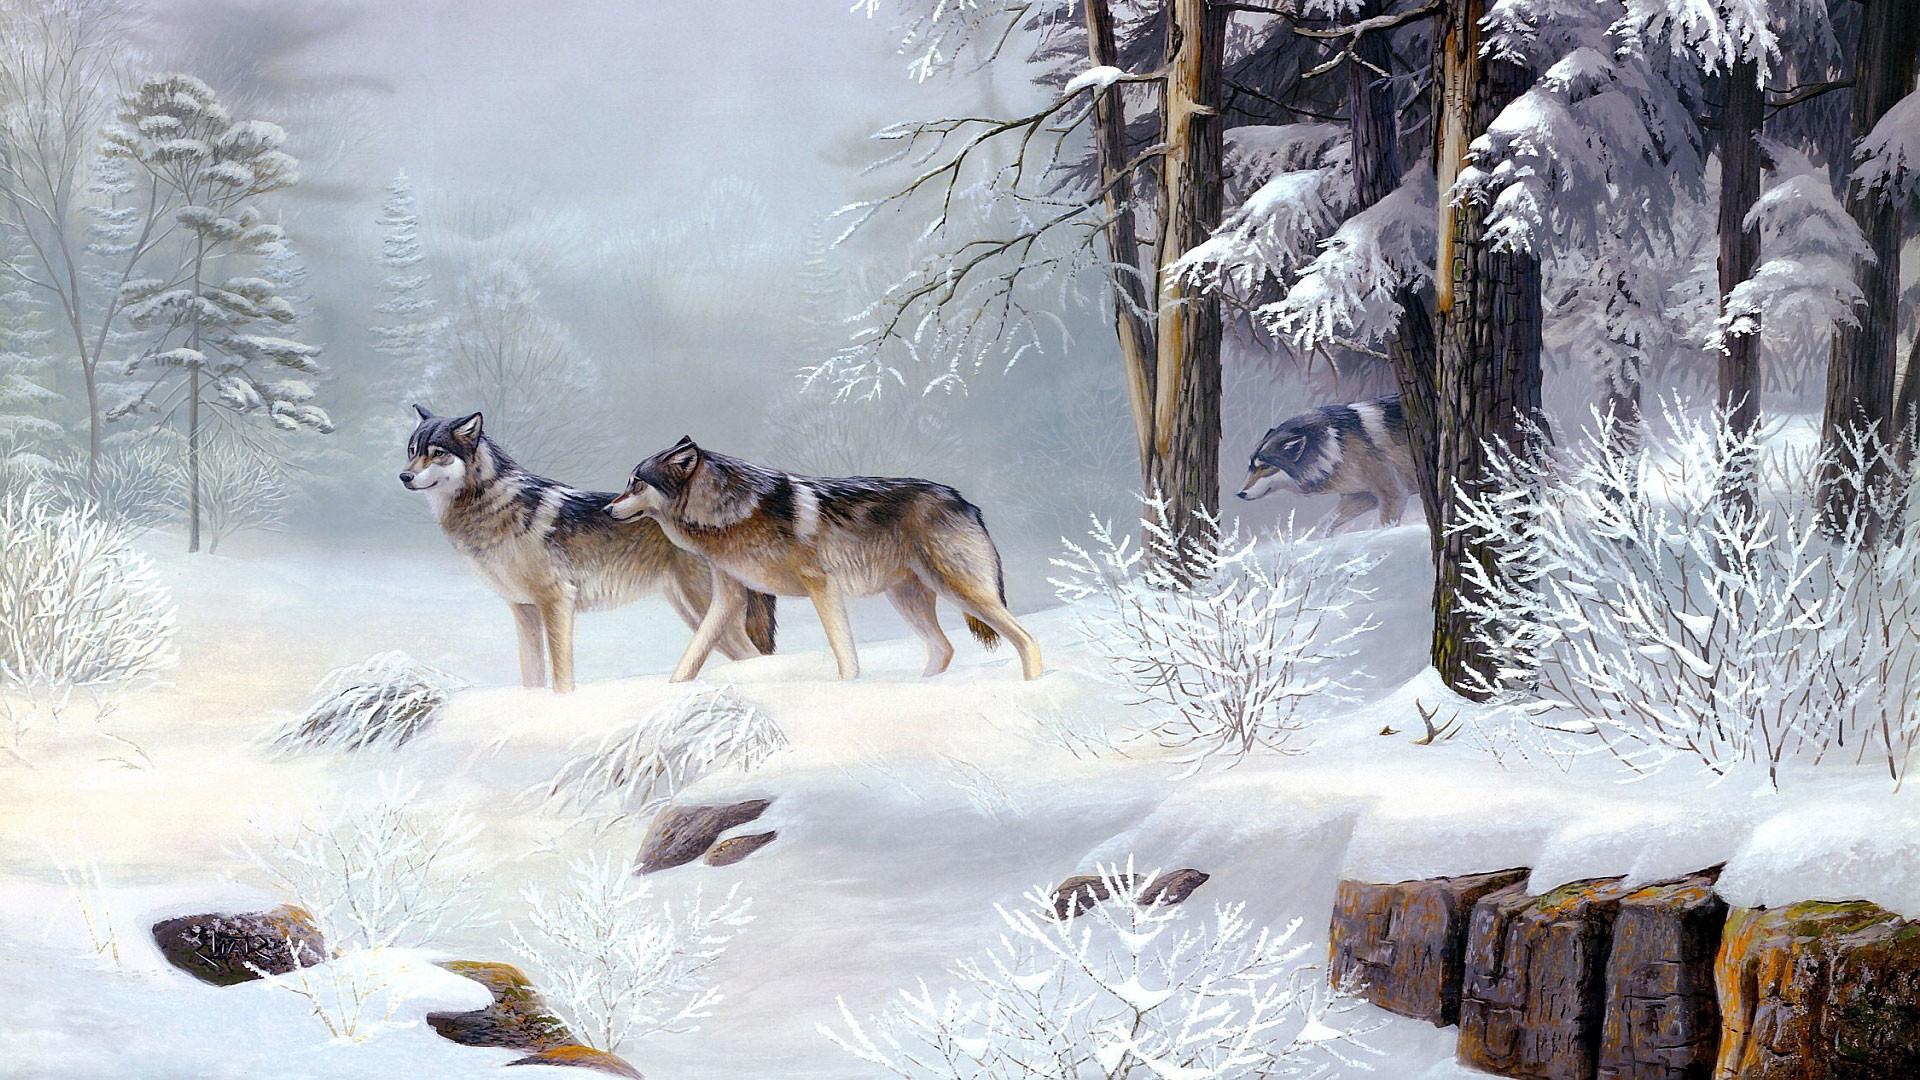 hd pics photos stunning wolfs 3d animated polar snow ice winter animals hd  quality desktop background